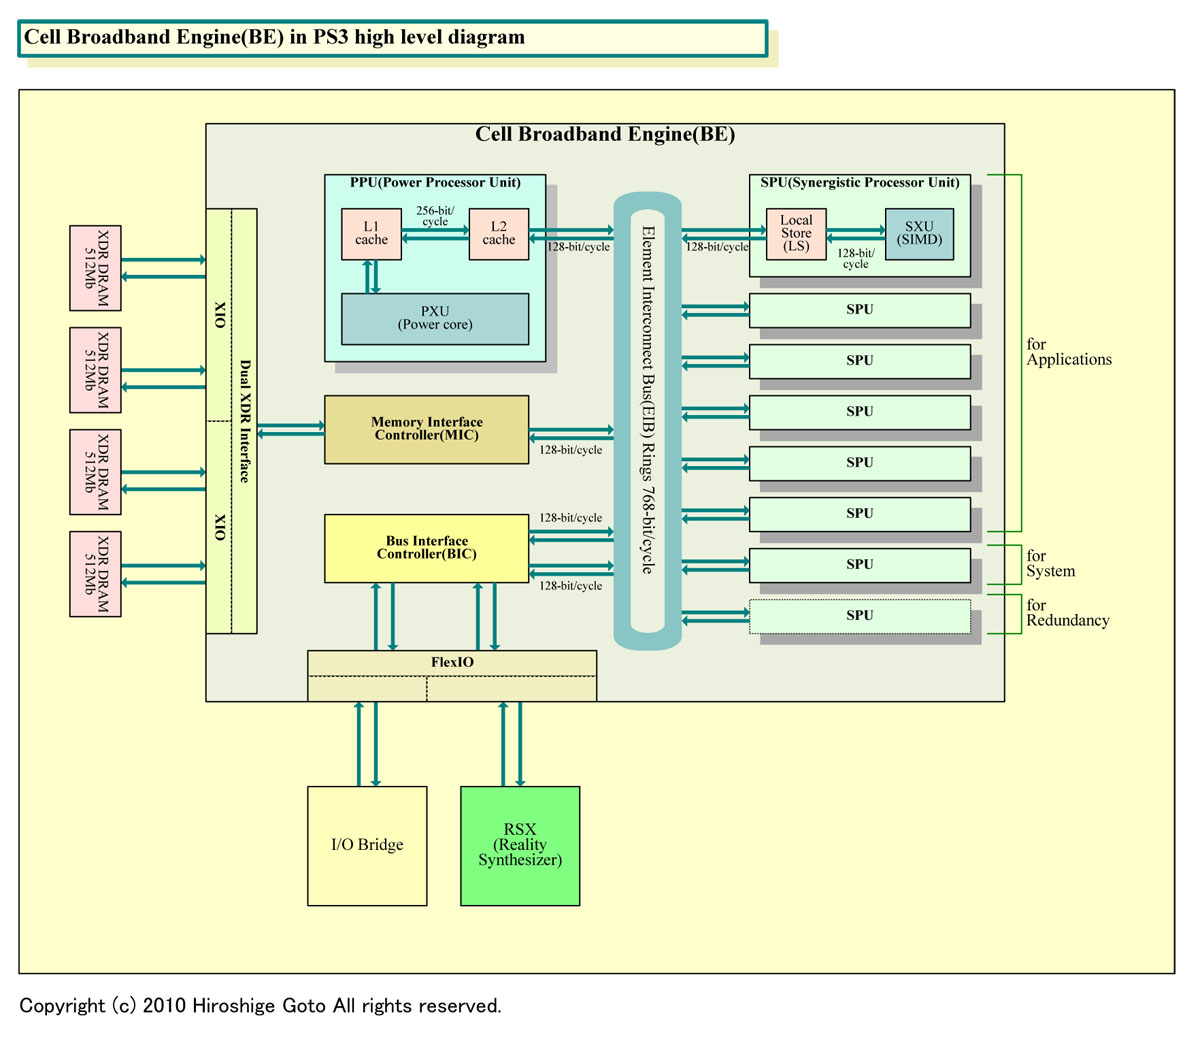 "Cell Broadband Engineのダイアグラム(PDF版は<span class=""img-inline raw""><a href=""/video/pcw/docs/589/315/p09.pdf"" ipw_status=""1"" ipw_linktype=""filelink_raw"" class=""resource"">こちら</a></span>)"